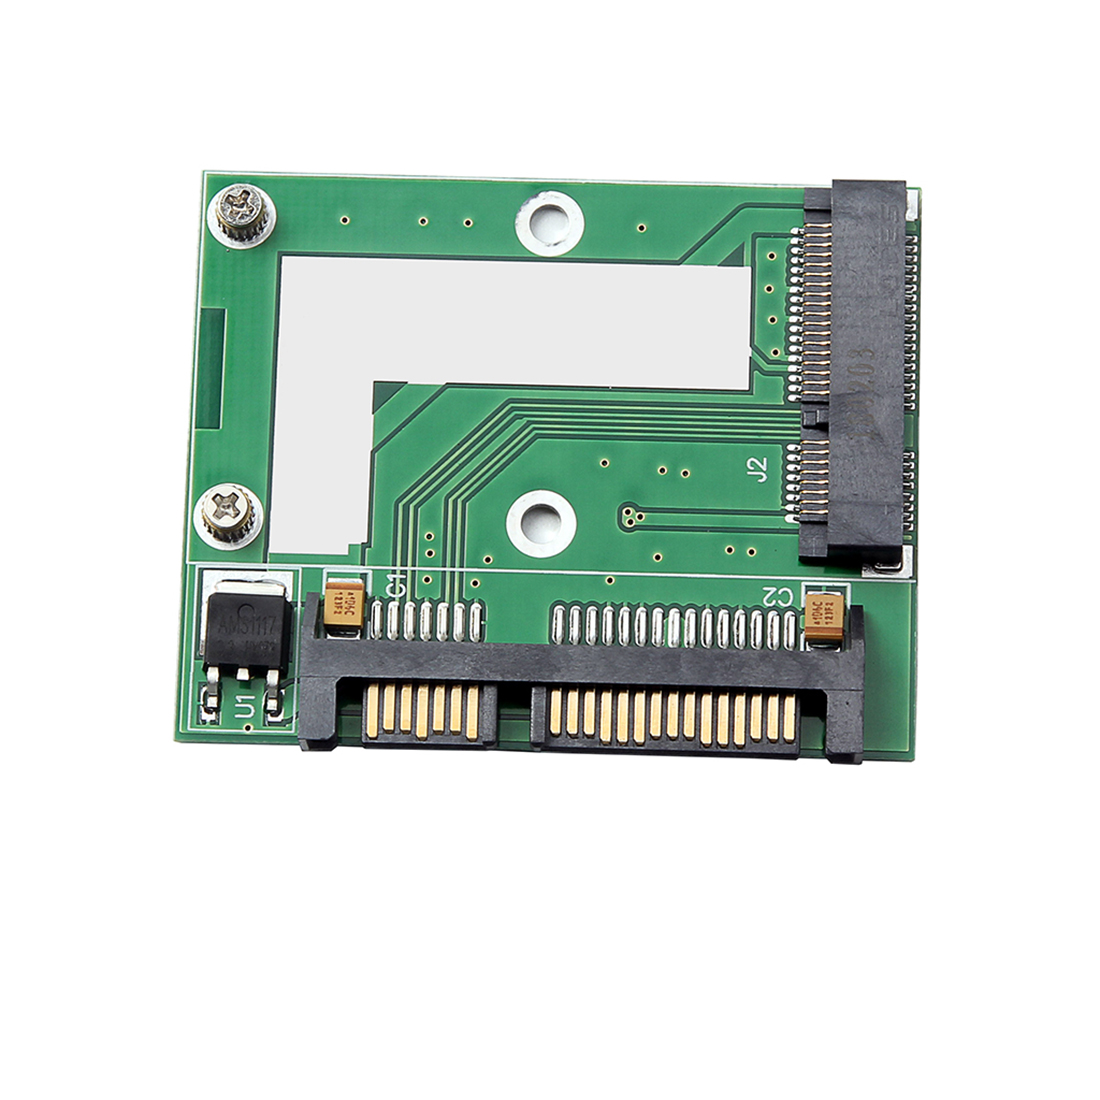 6.0 Gbps Half-height/5cm PCI-E MSATA SSD to 2.5-inch SATA Adapter Card Converter SATA3 MINI PCI Express Module Board for Desktop Computer green